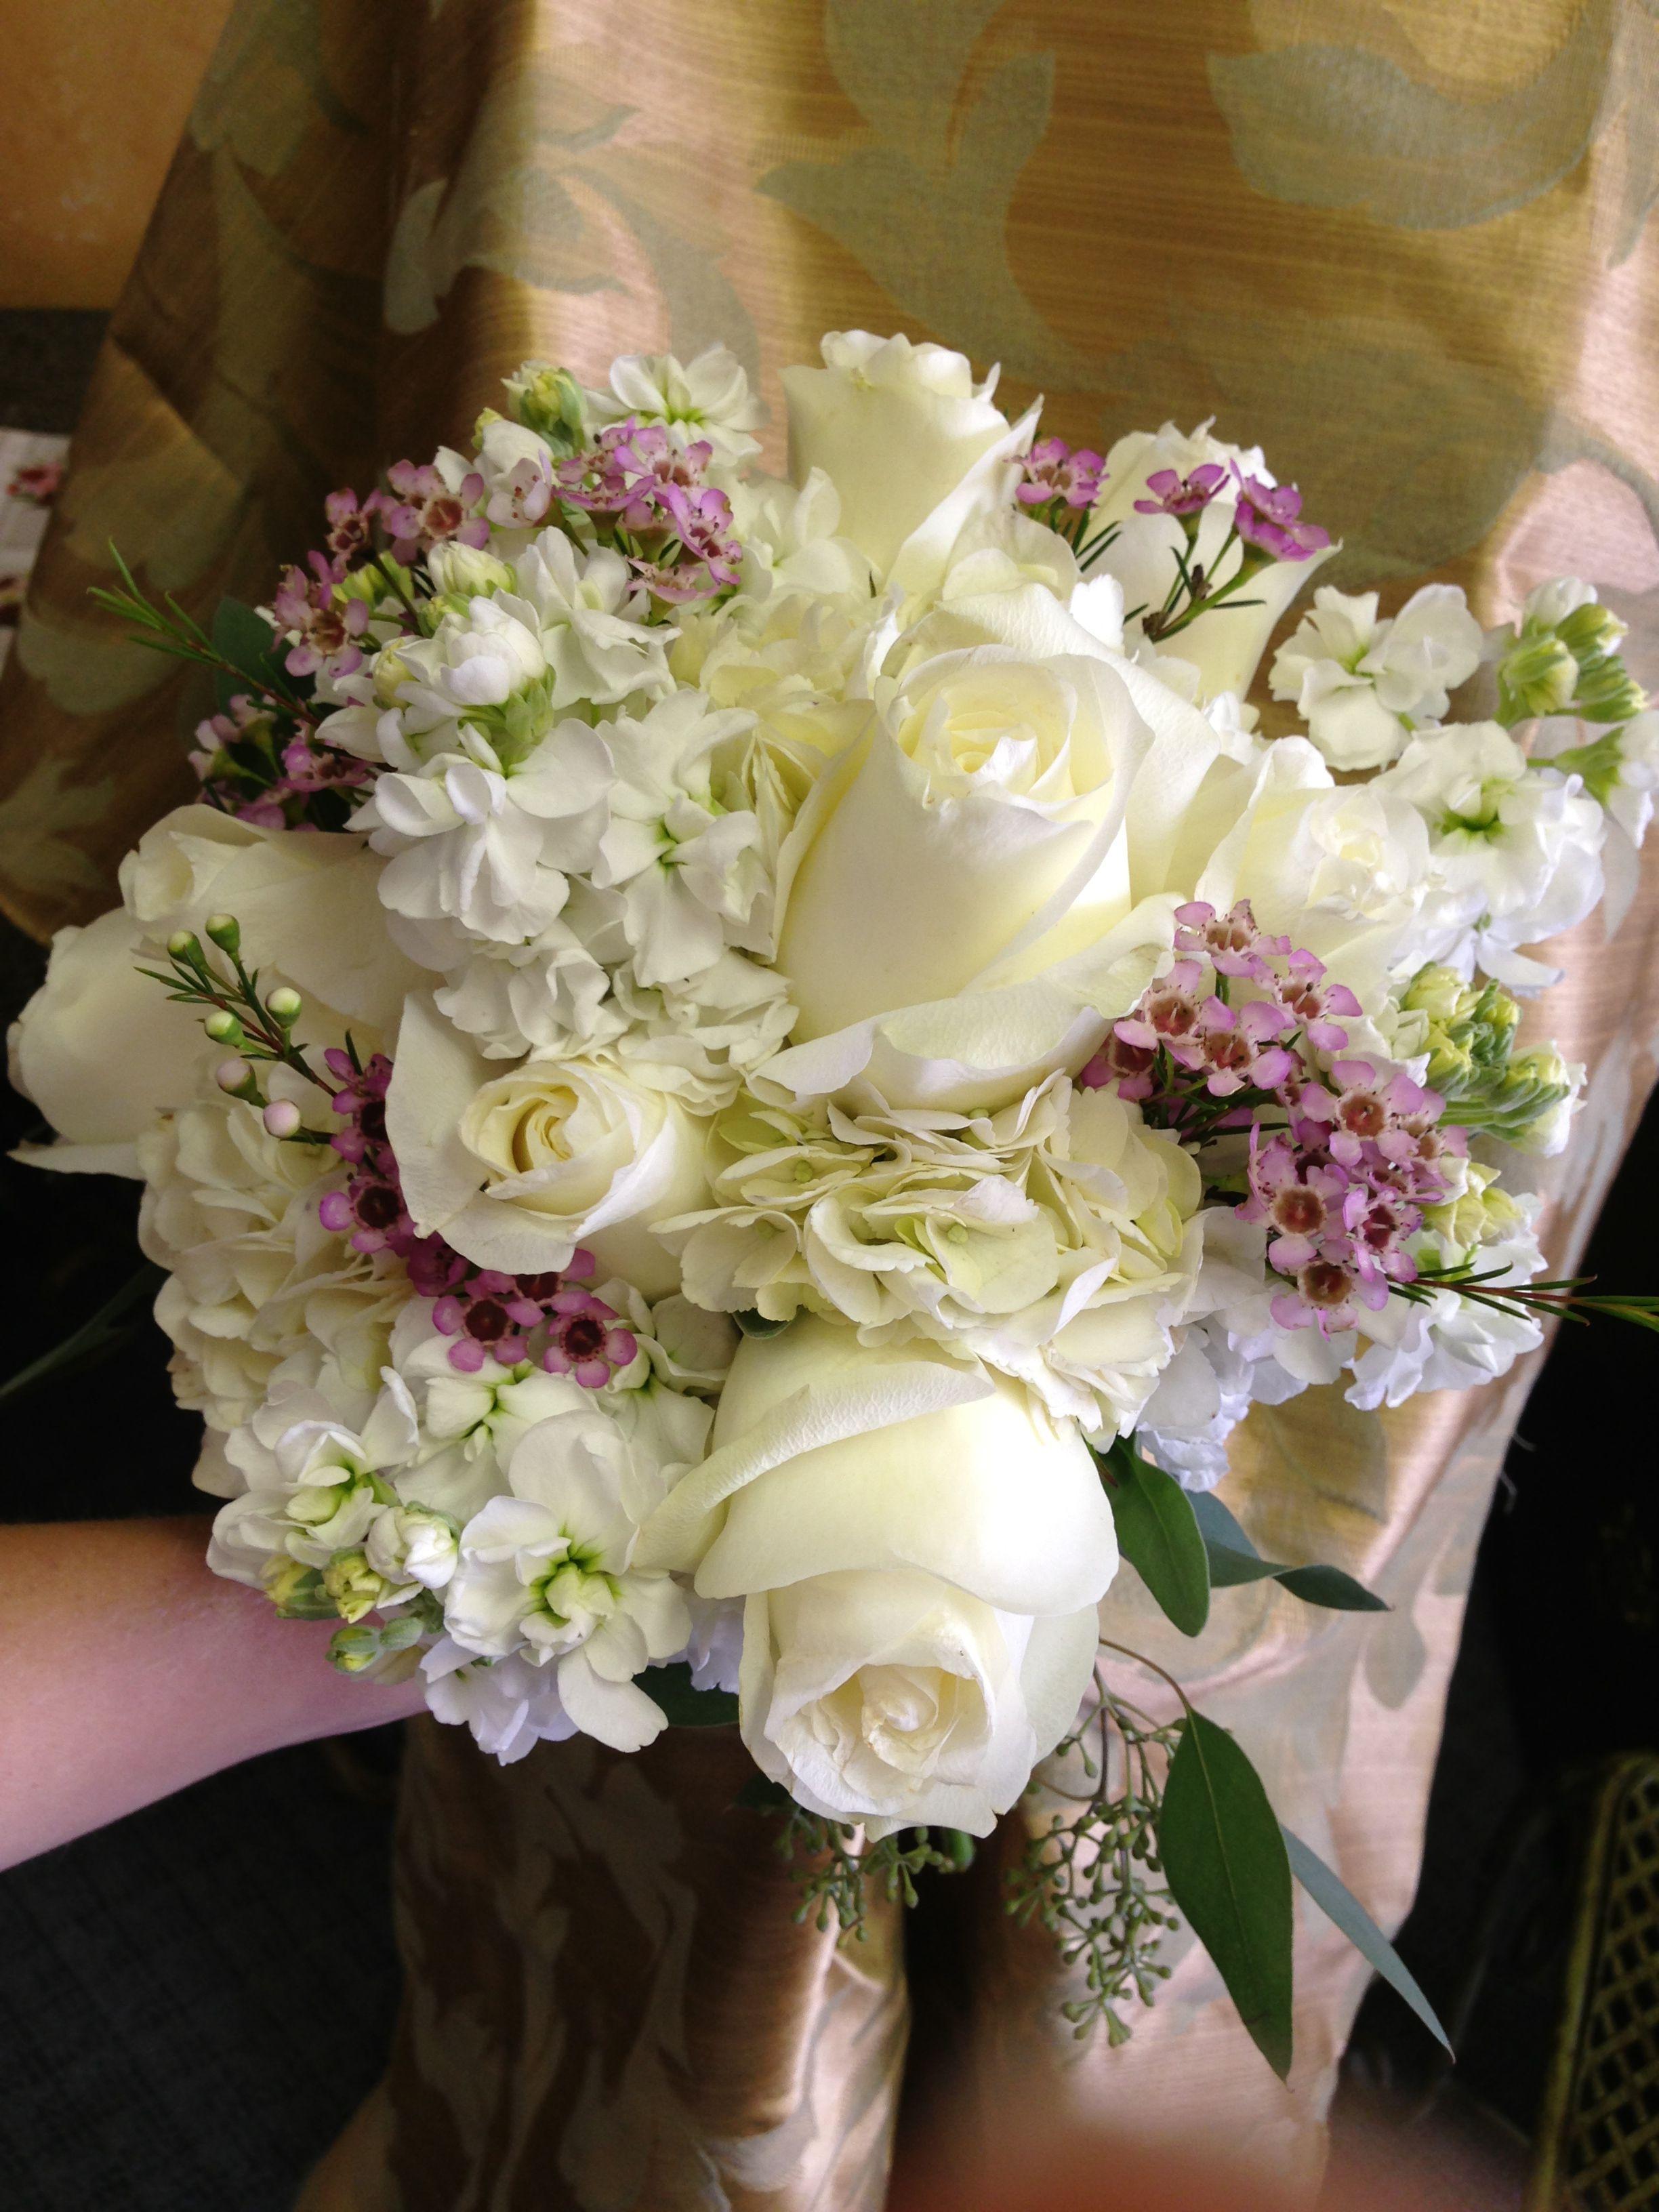 Bridal Bouquet Designed By Ann S Flowers Yukon Ok Bouquet Design Floral Wreath Bridal Bouquet